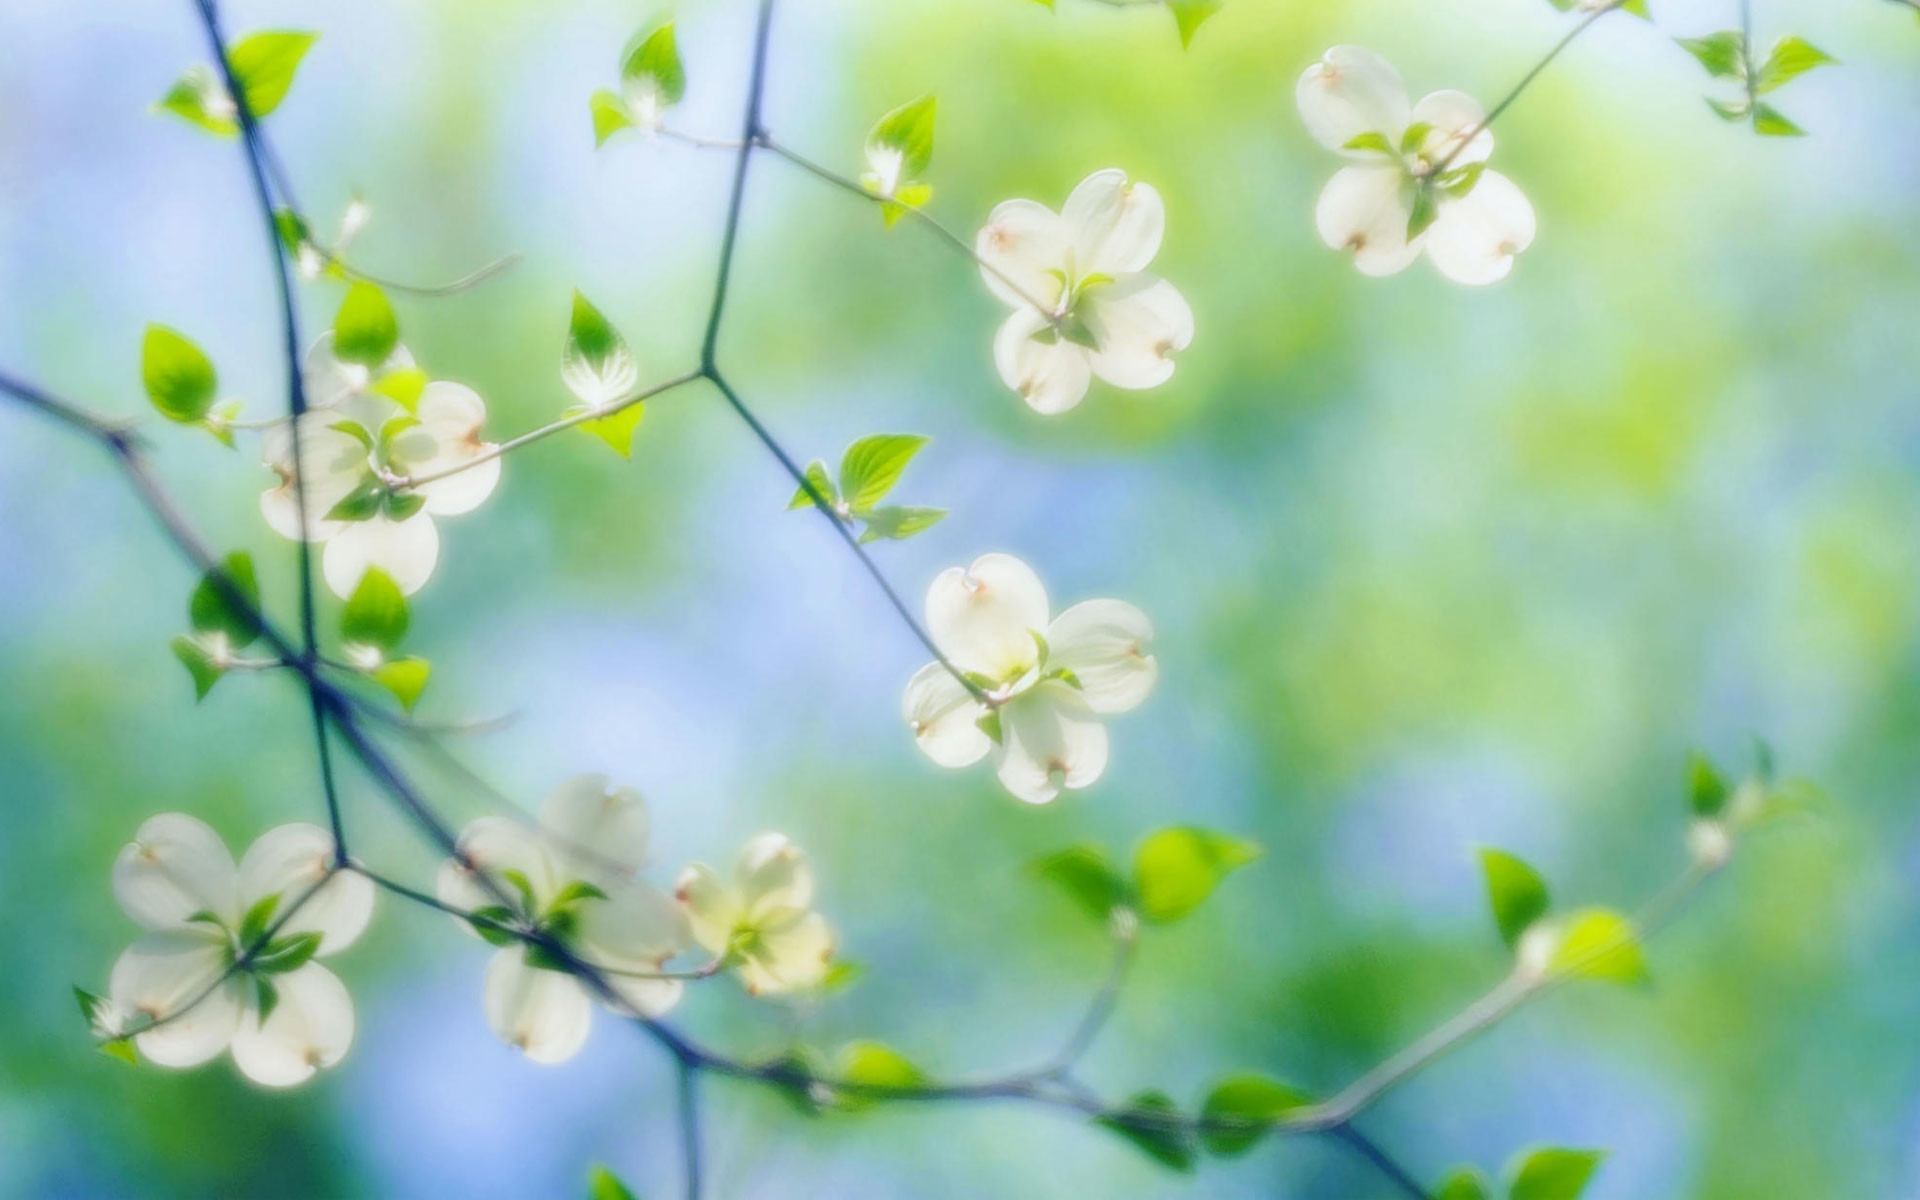 Dogwood Flowers Wallpaper